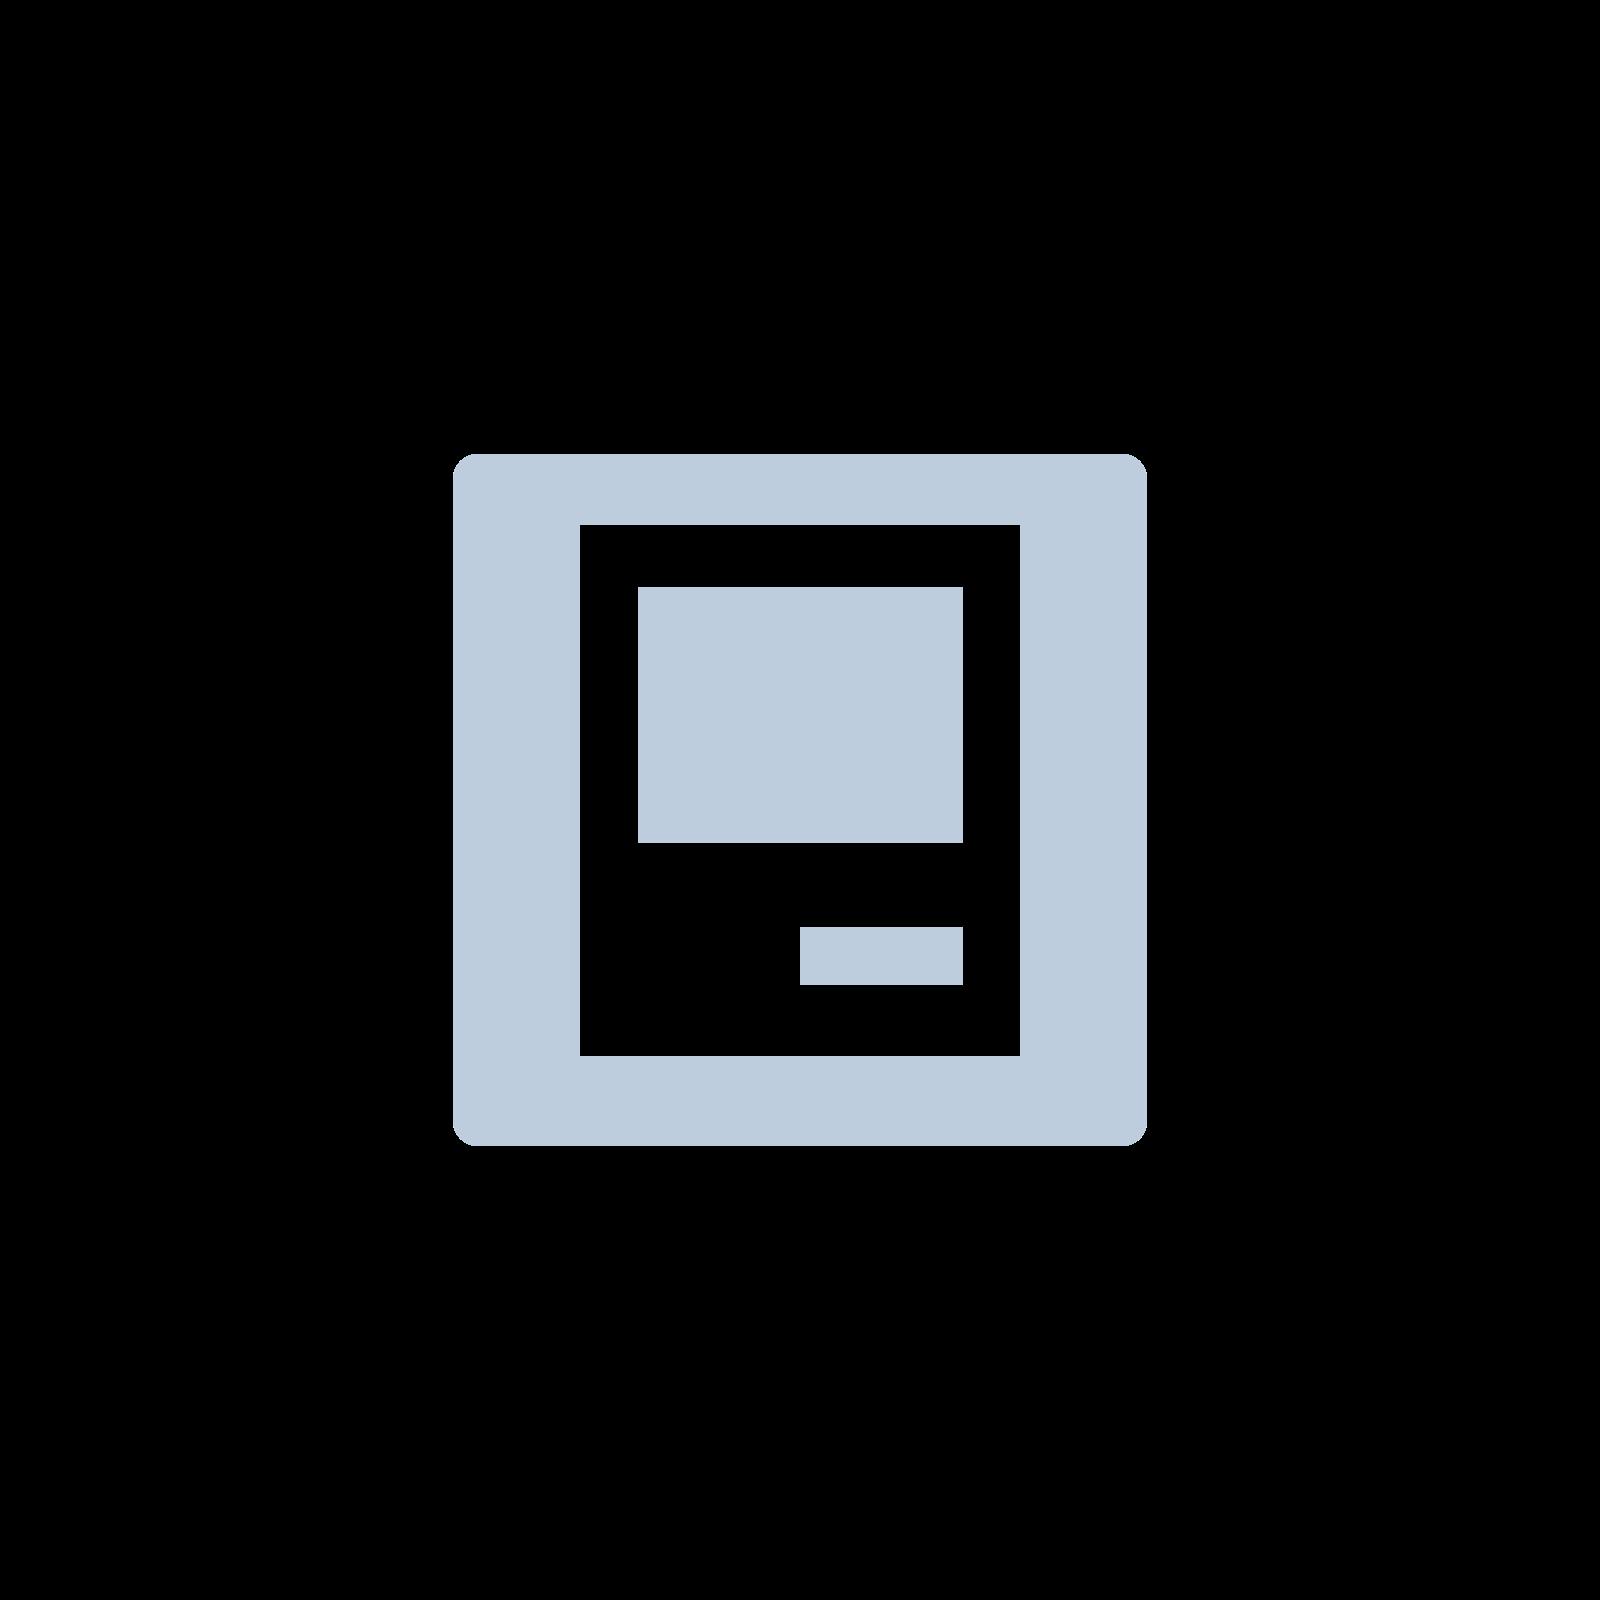 Mac Pro Intel Xeon QuadCore 2.66GHz (Mac Pro1,1)